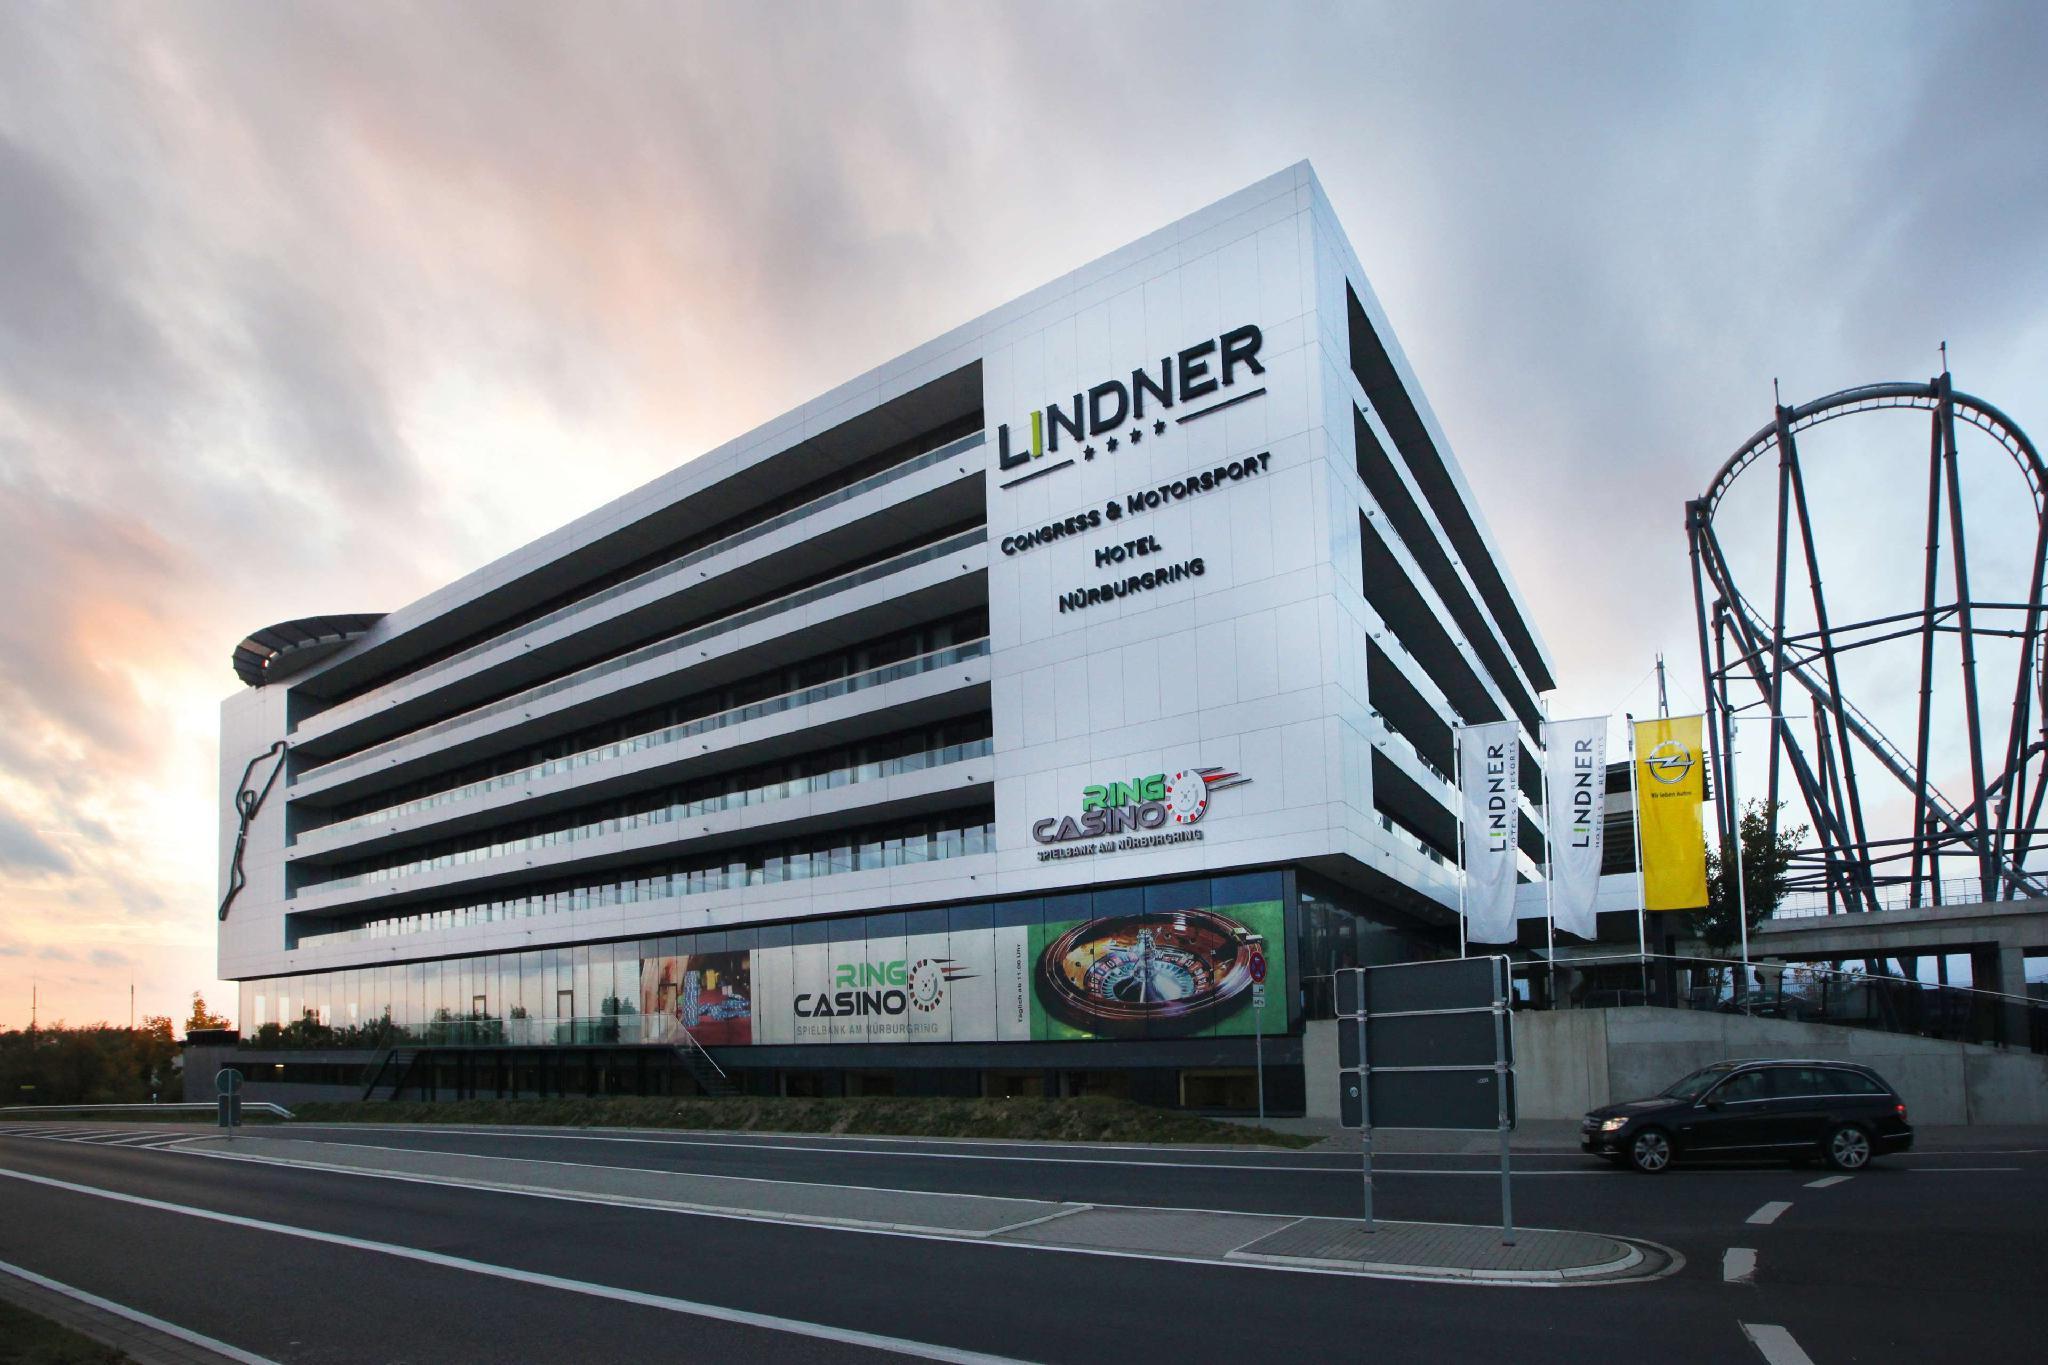 Lindner Nurburgring Congress Hotel